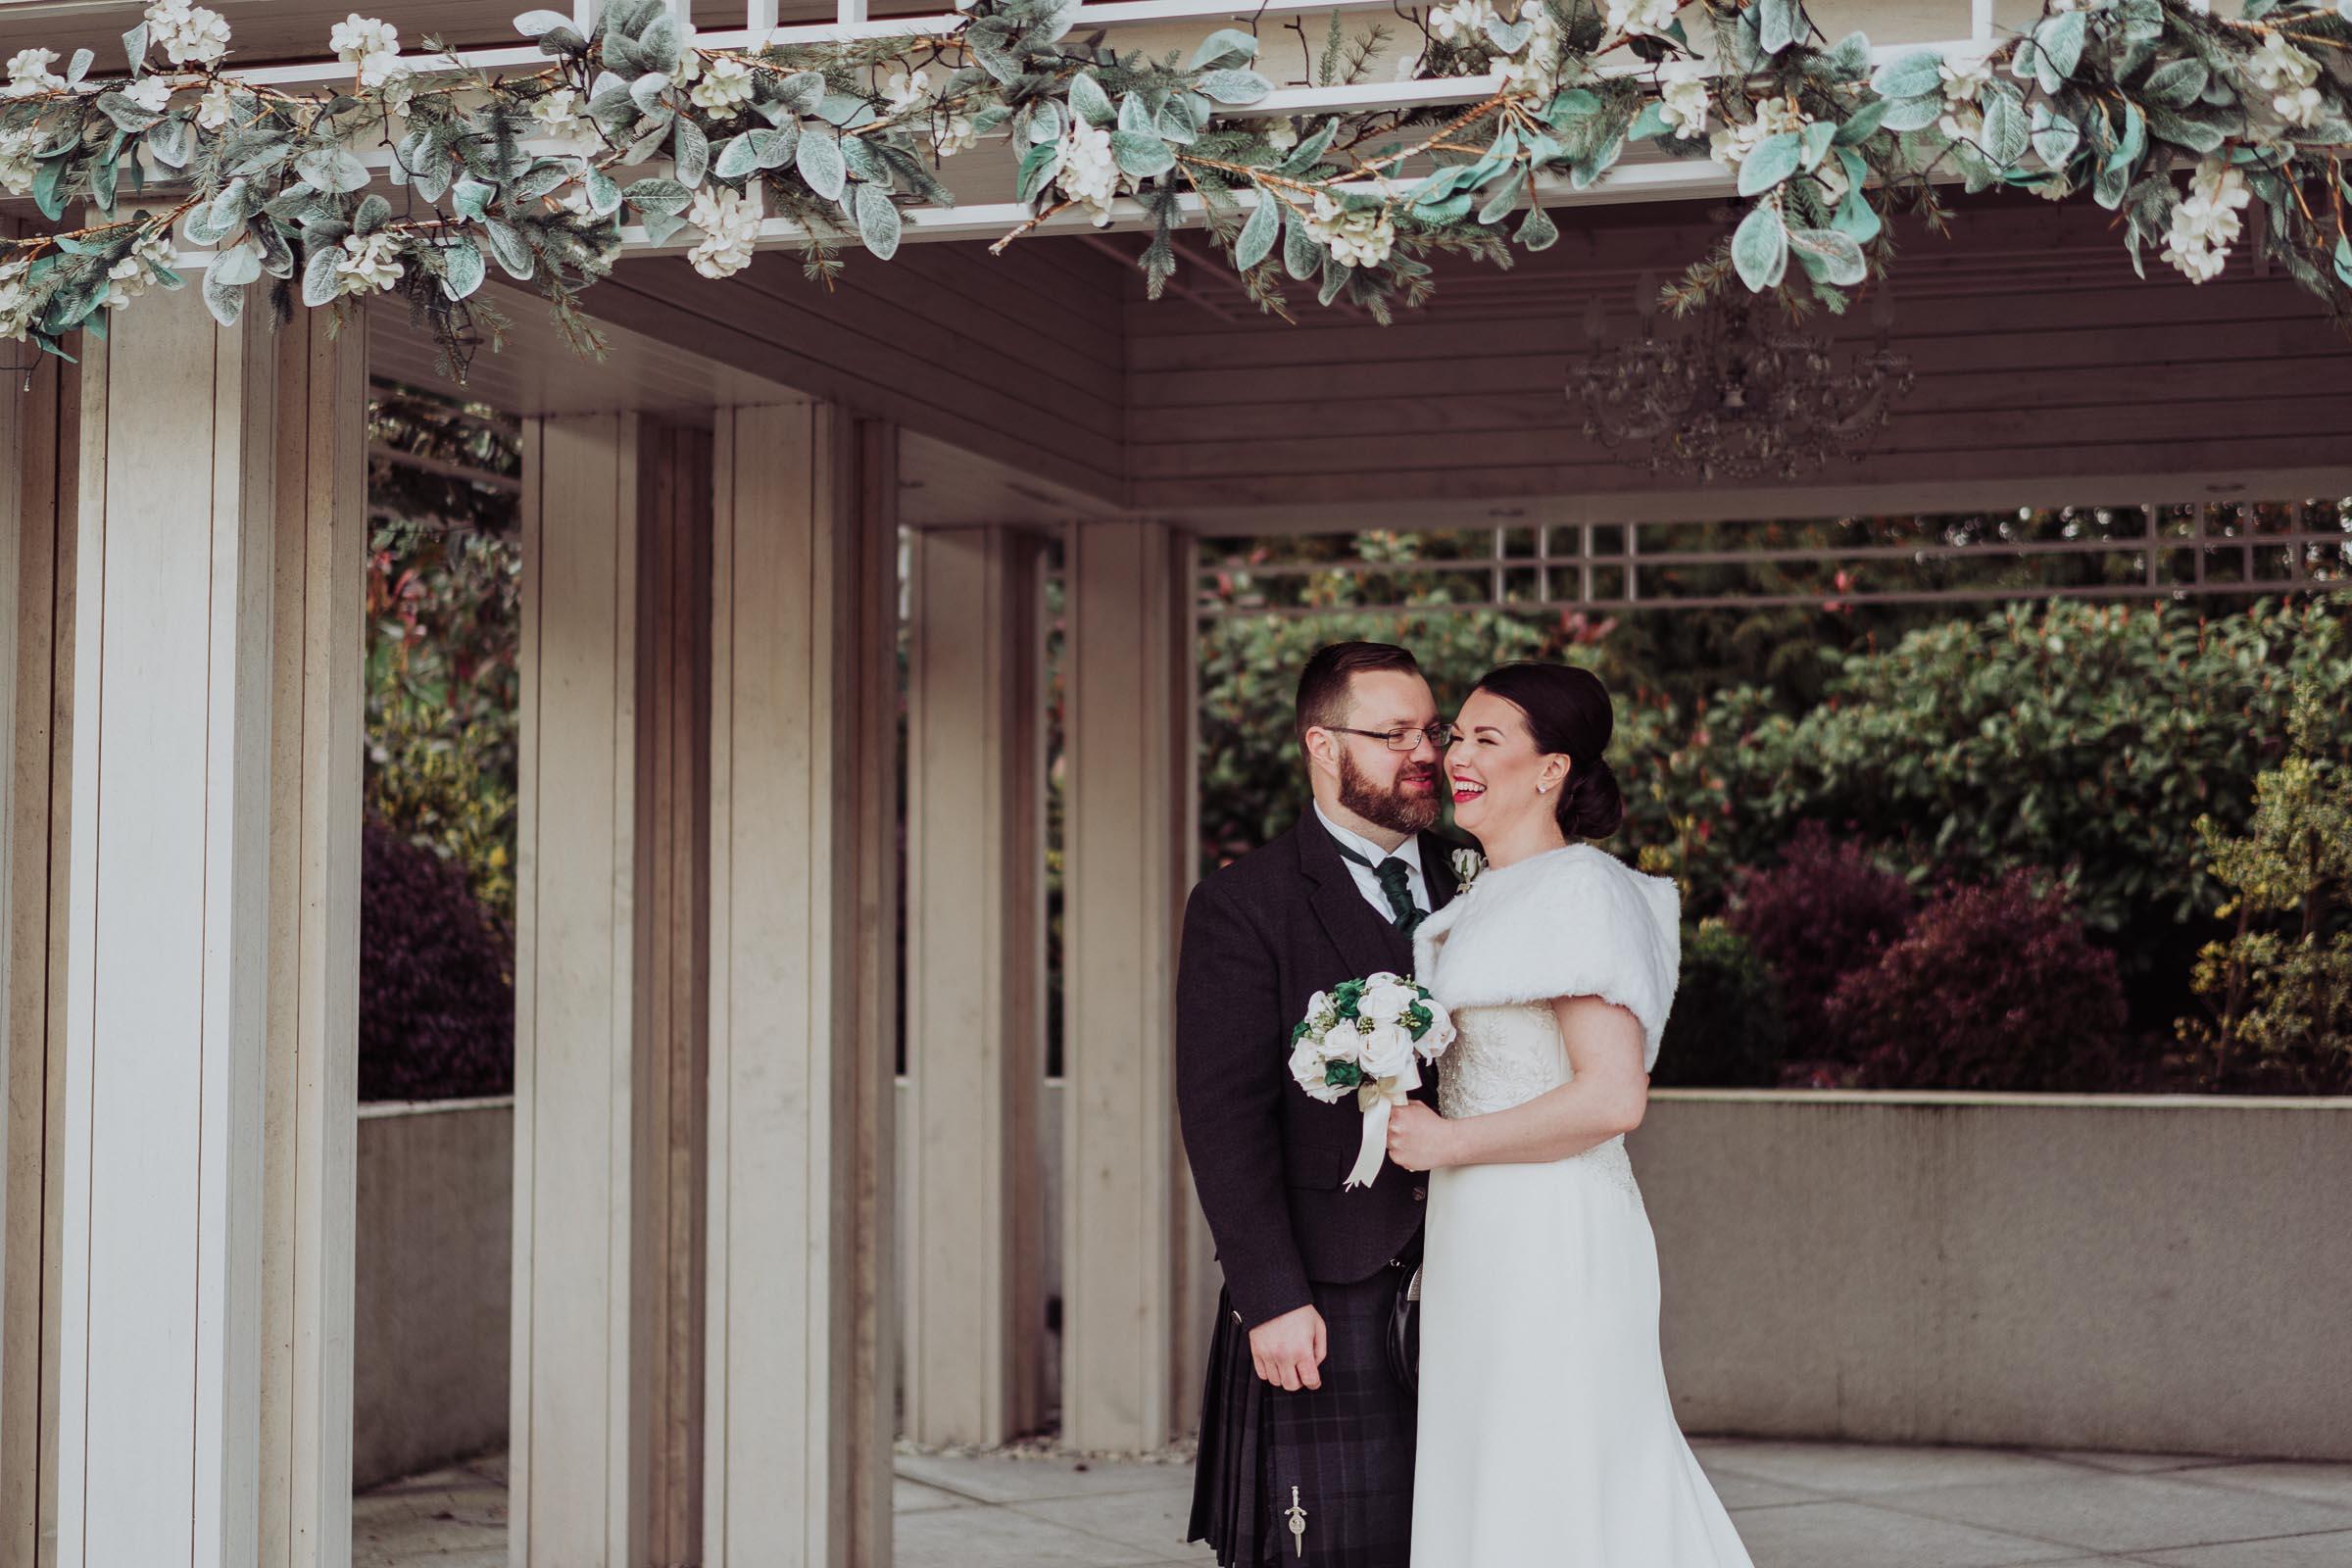 Radstone-Wedding-photographer-glasgow (1 of 5).jpg